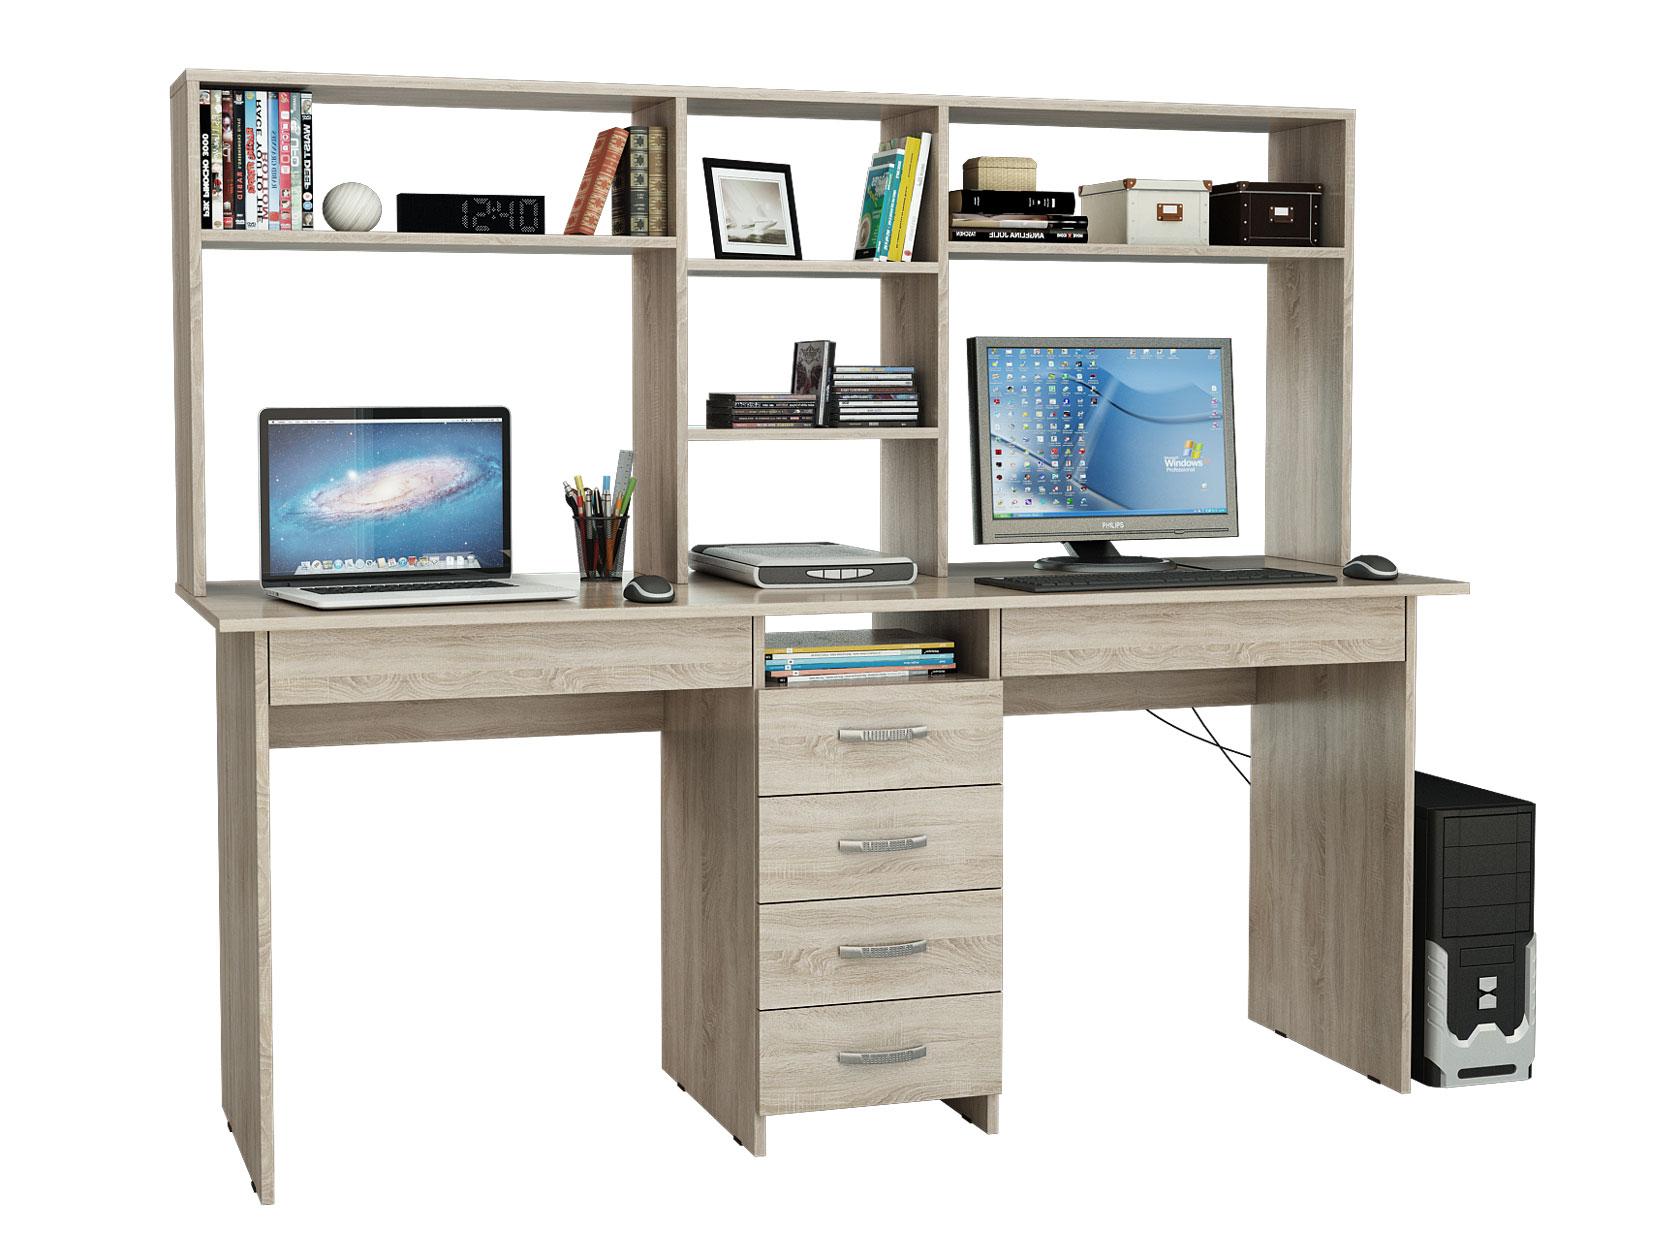 Компьютерный стол МФ Мастер Тандем-2Я 174,8x60x141,8, дуб сонома